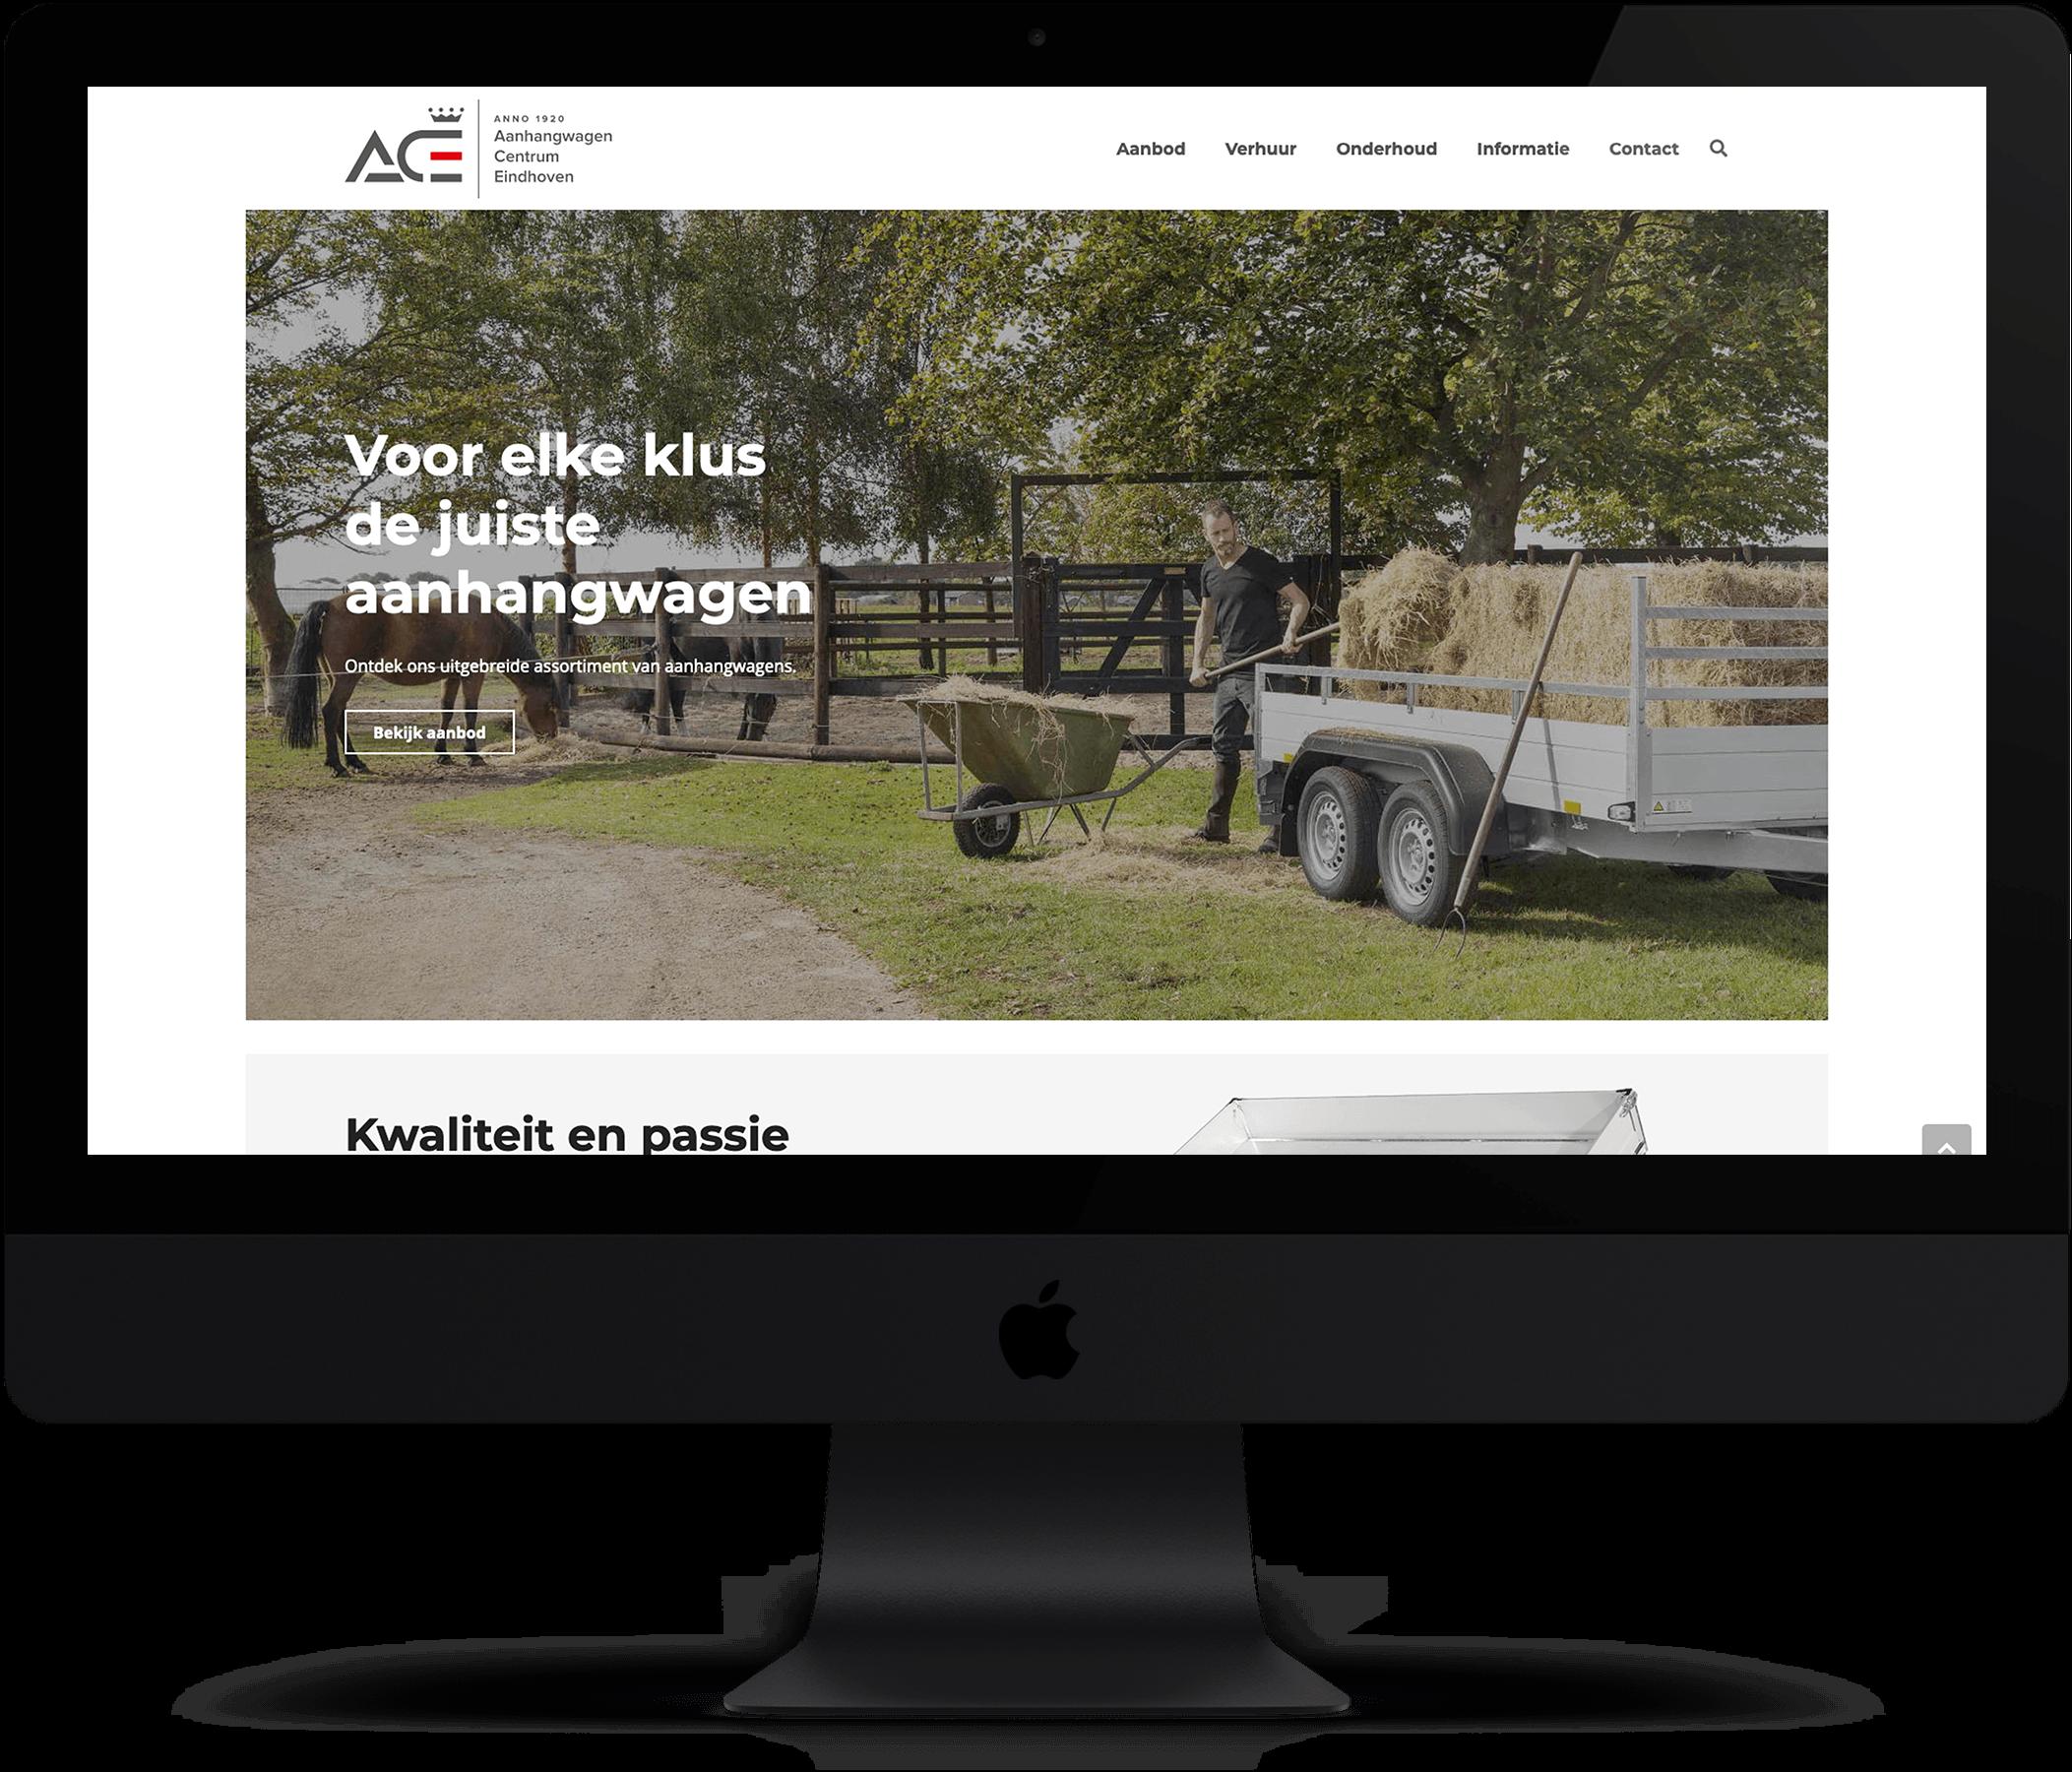 Website Aanhangwagen Centrum Eindhoven